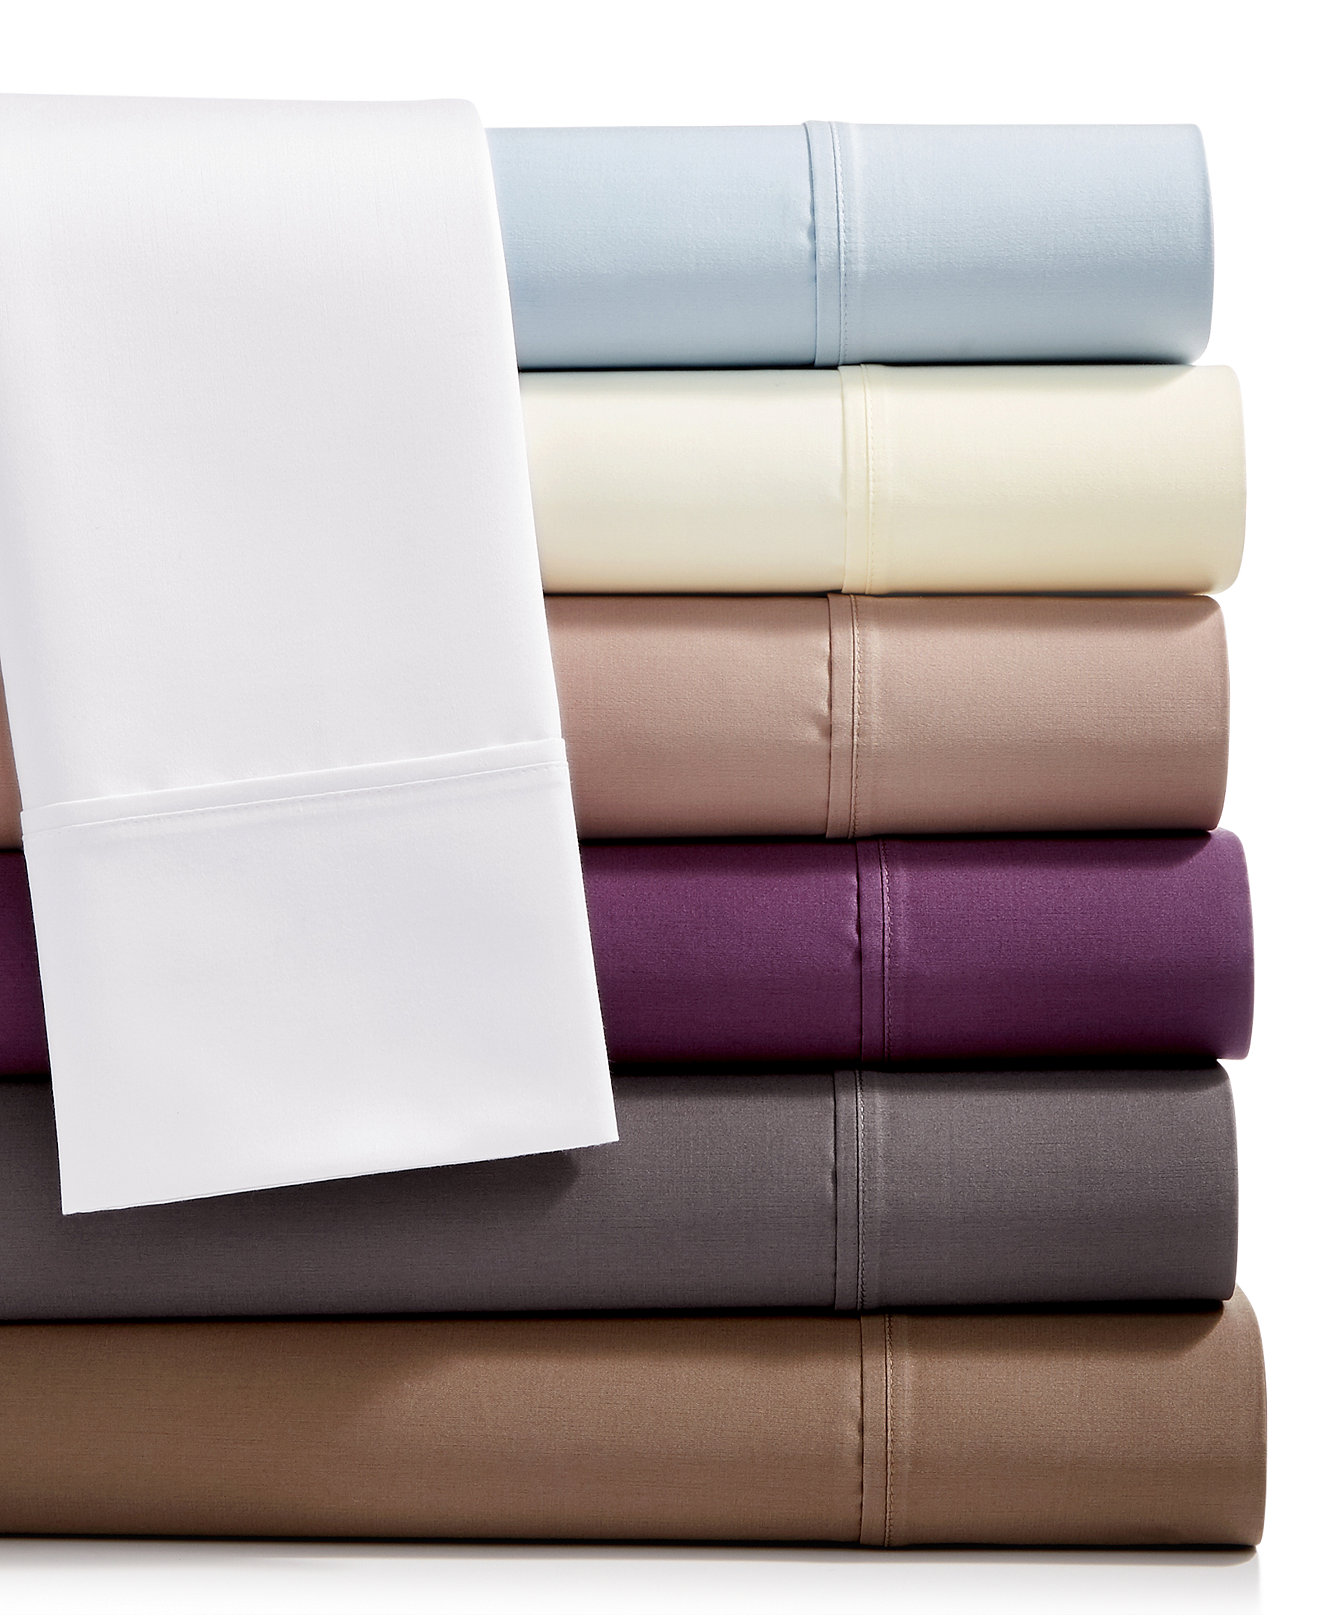 Aq Textiles Bergen 4 Pc Extra Deep Pocket Sheet Sets 1000 Thread